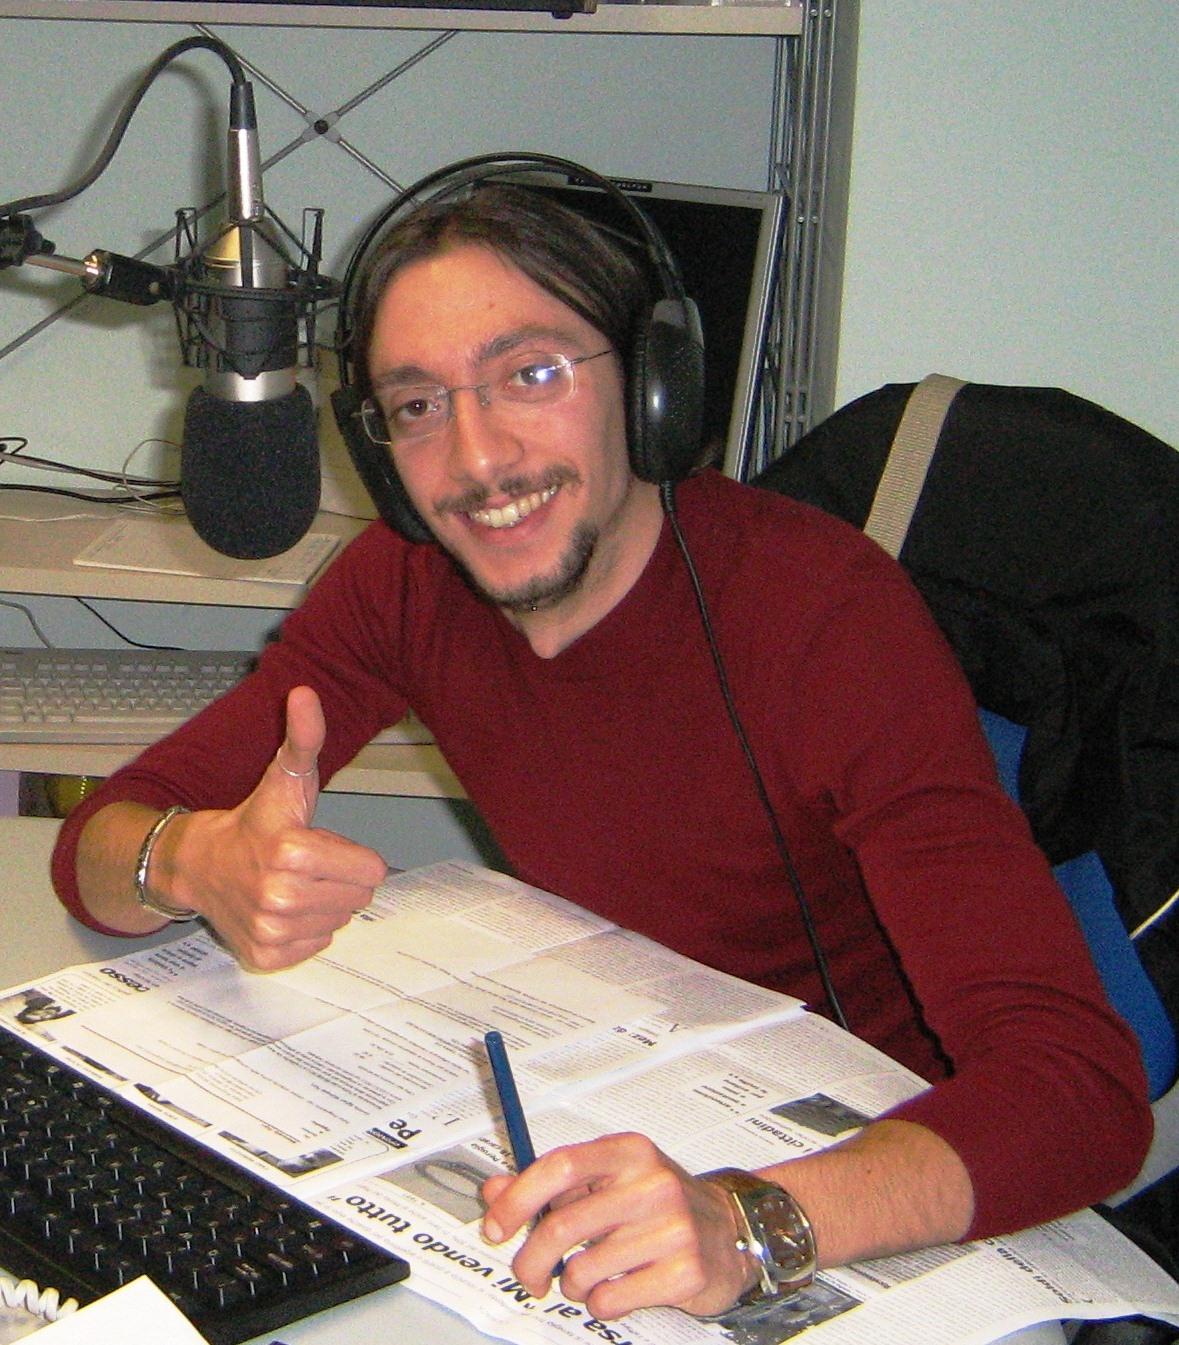 Manuele Fiori